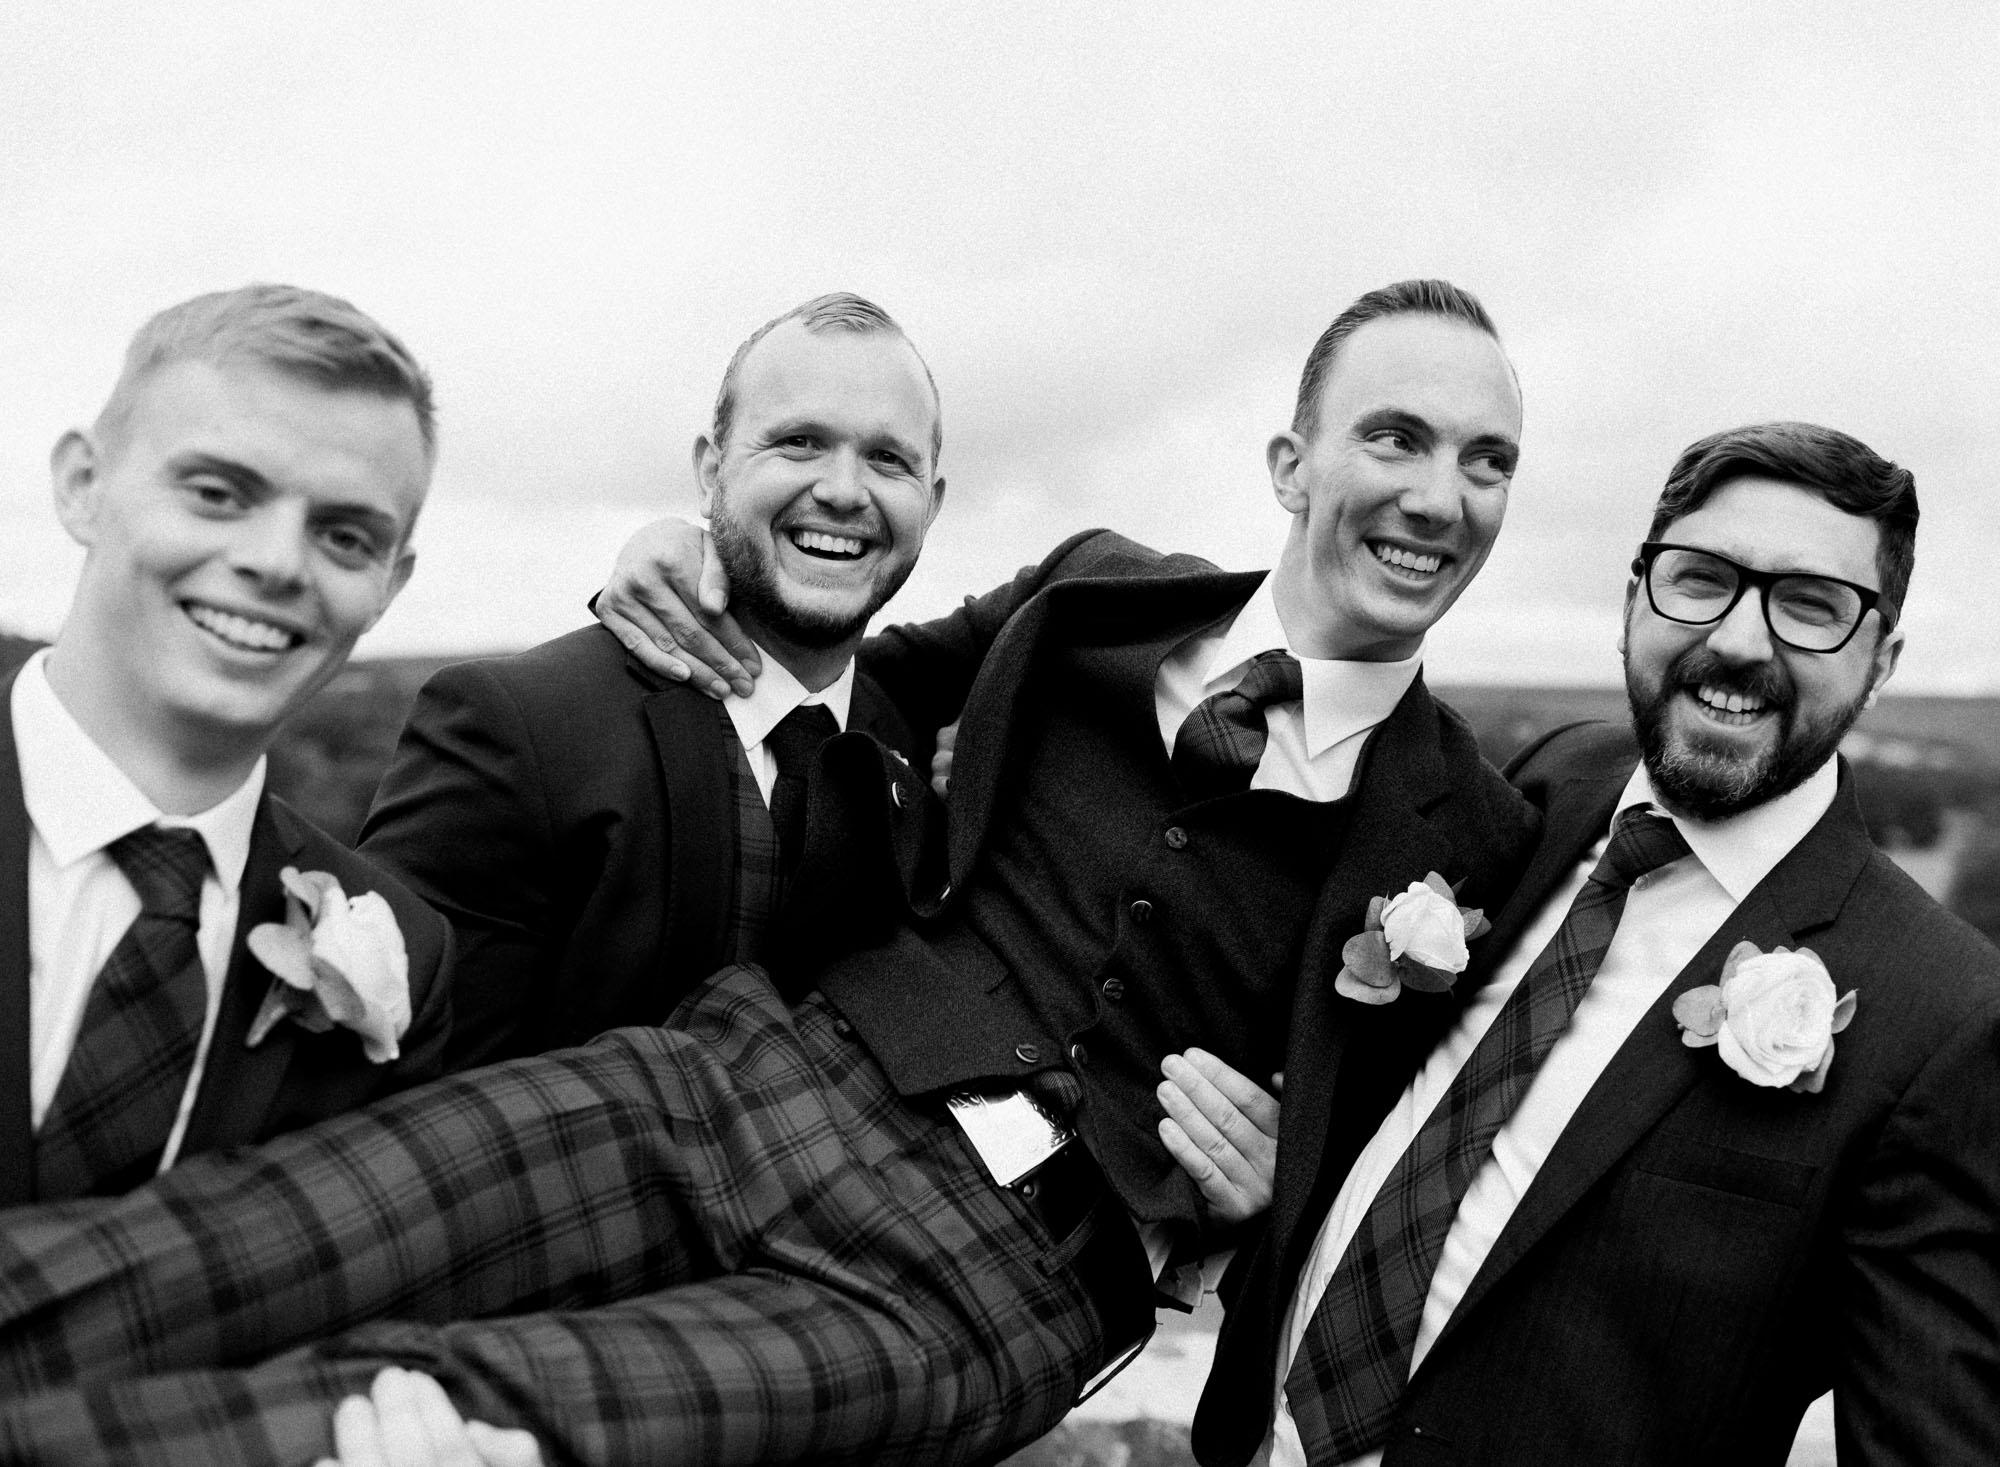 scottish_wedding_blairquhan_castle-77.jpg